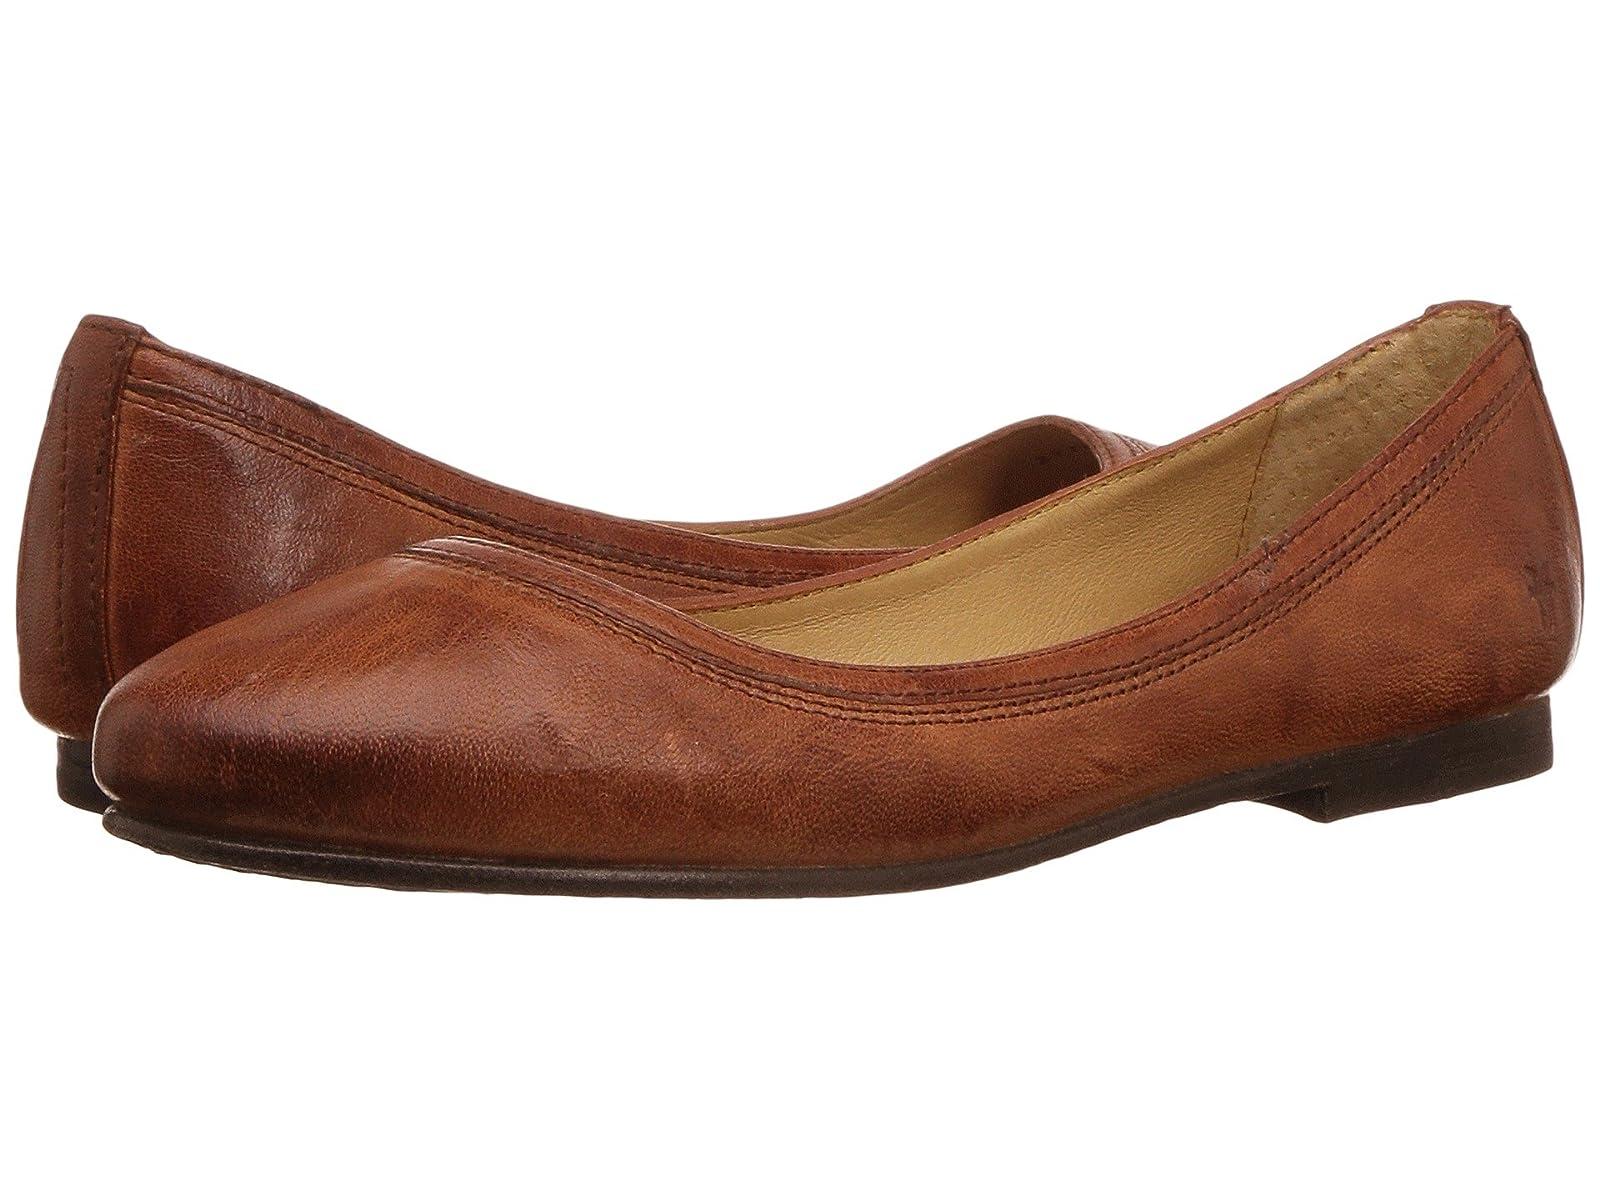 Frye Carson BalletAtmospheric grades have affordable shoes